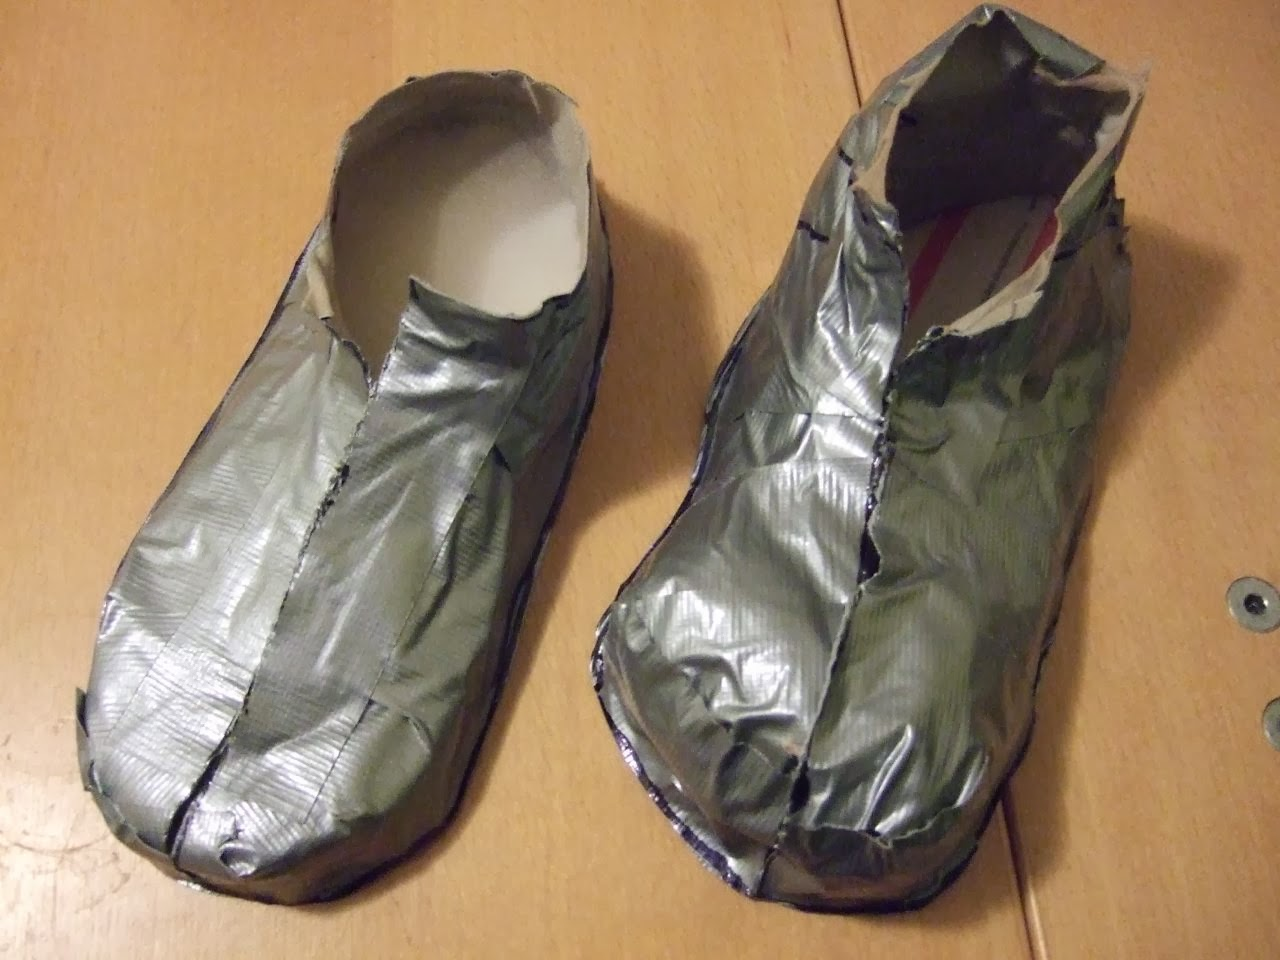 Repairing Running Shoes Soles